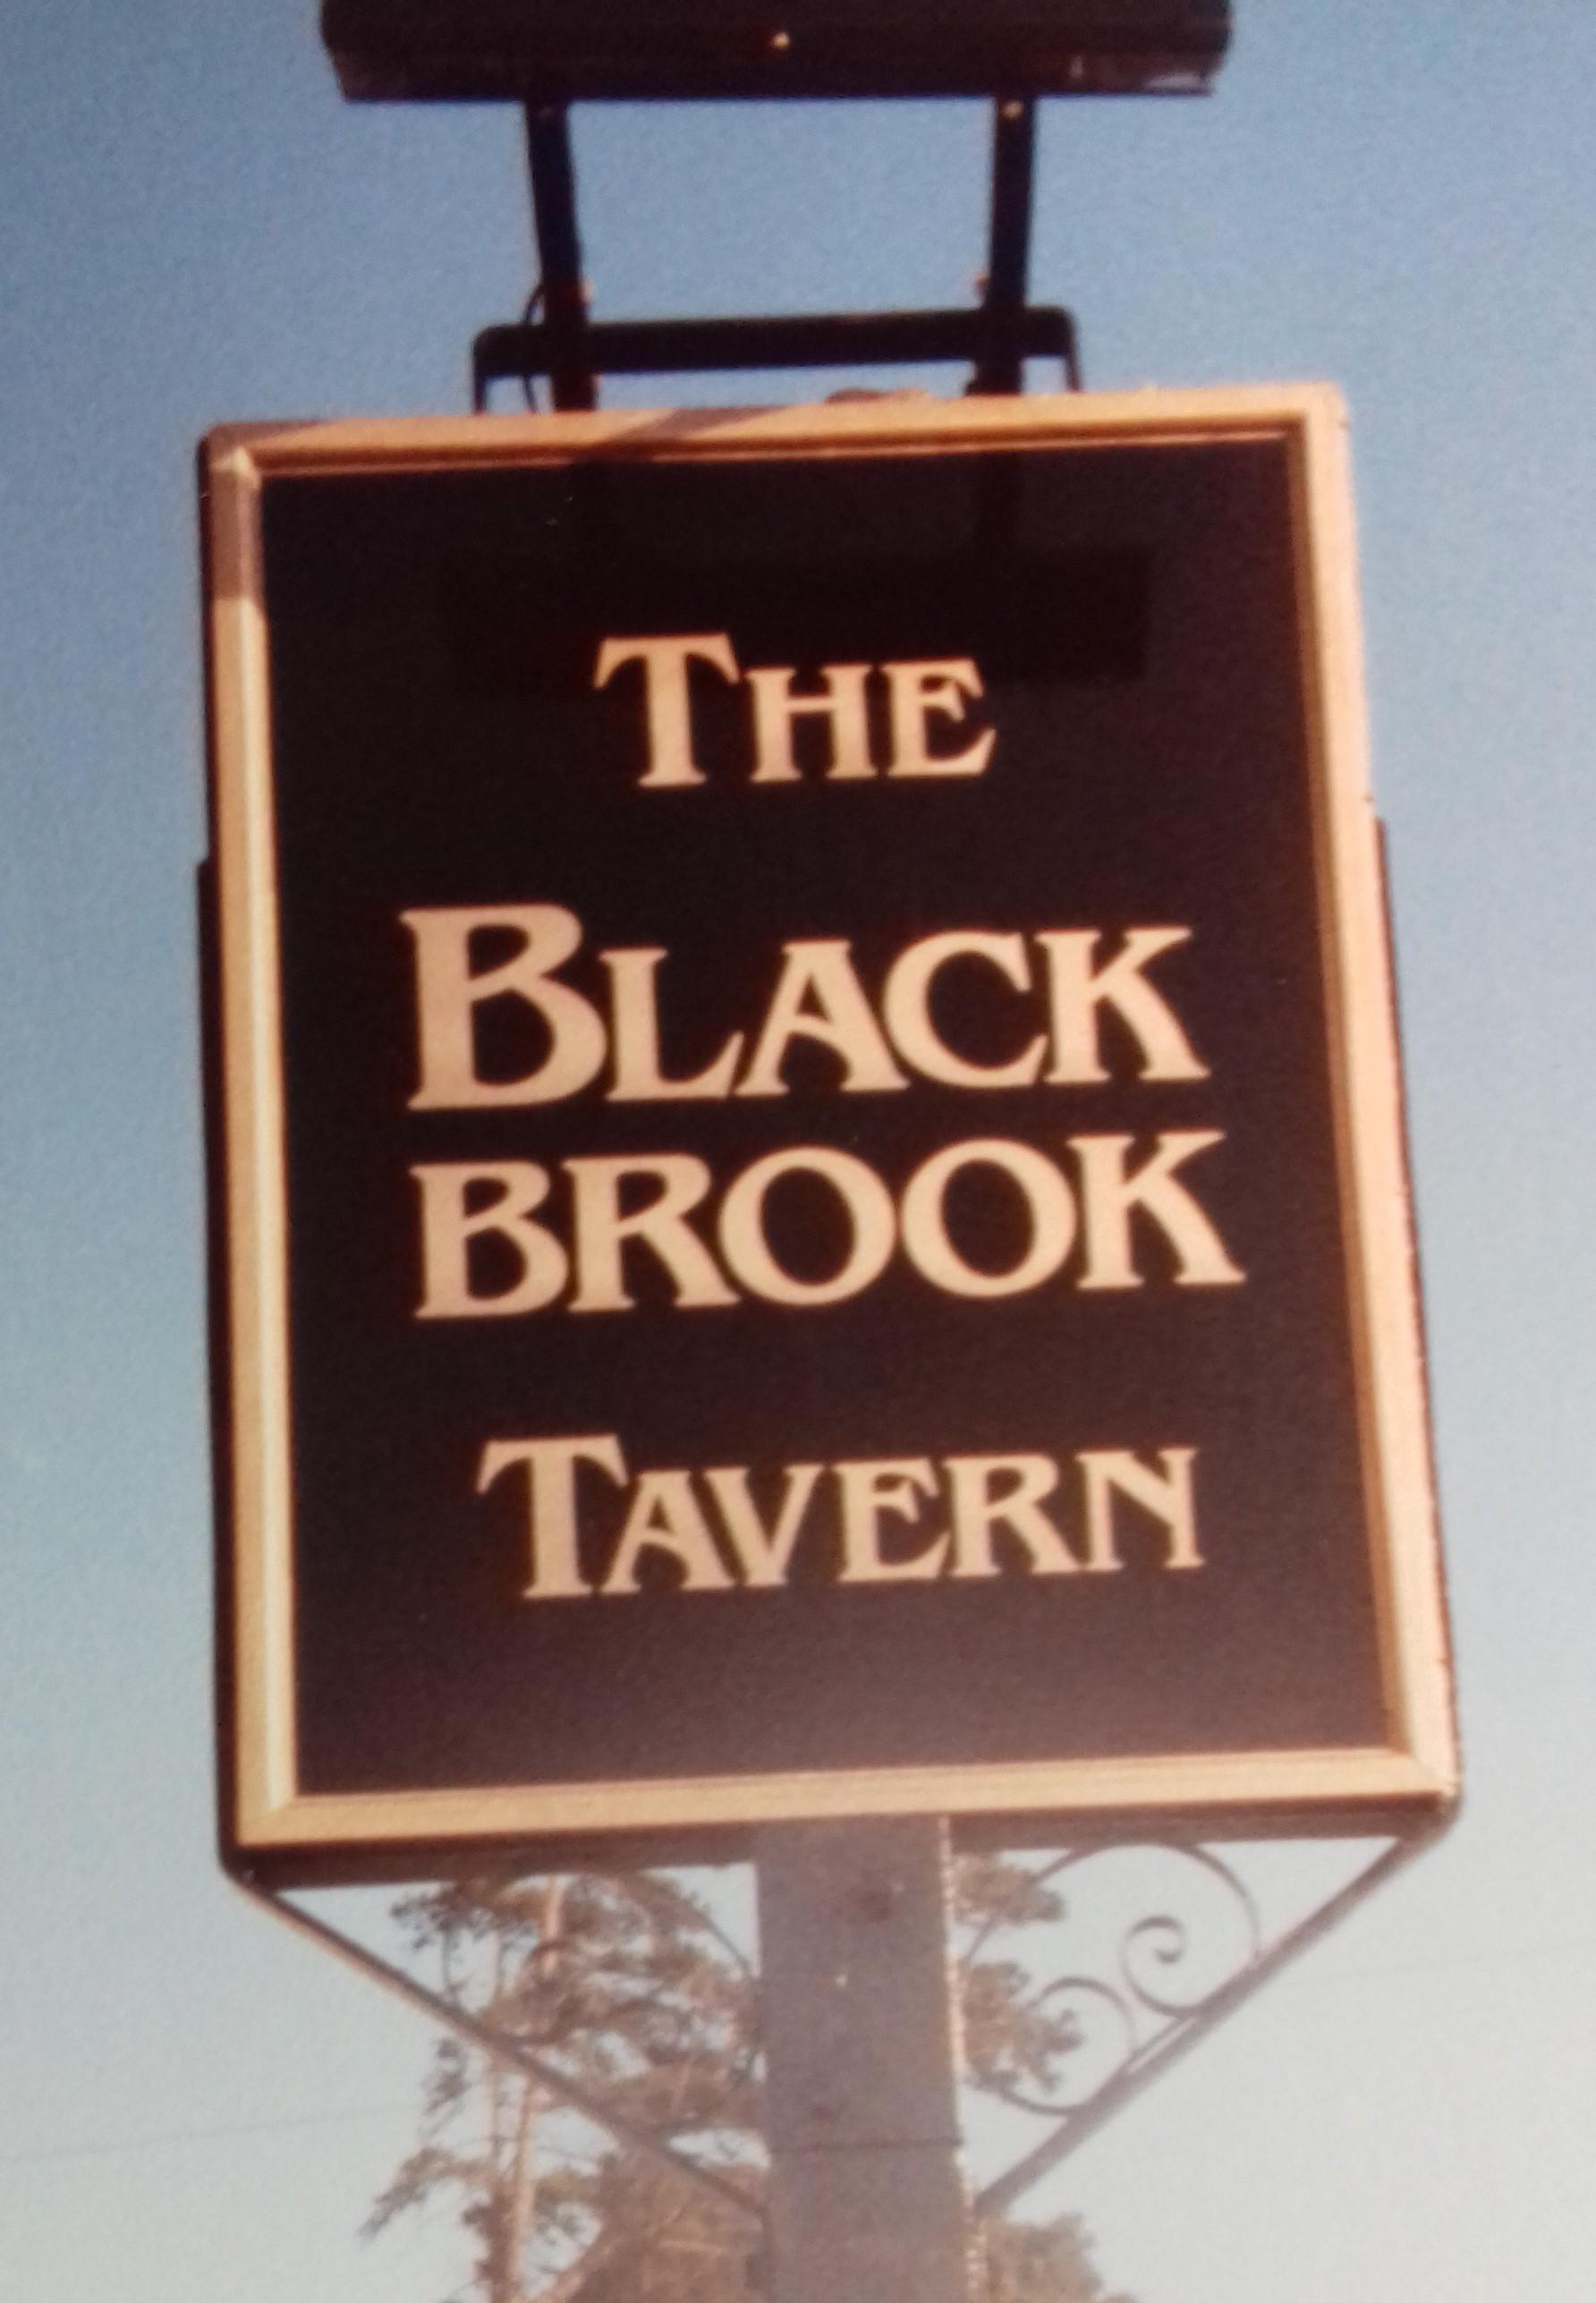 OLD SIGN: The Blackbrook Tavern